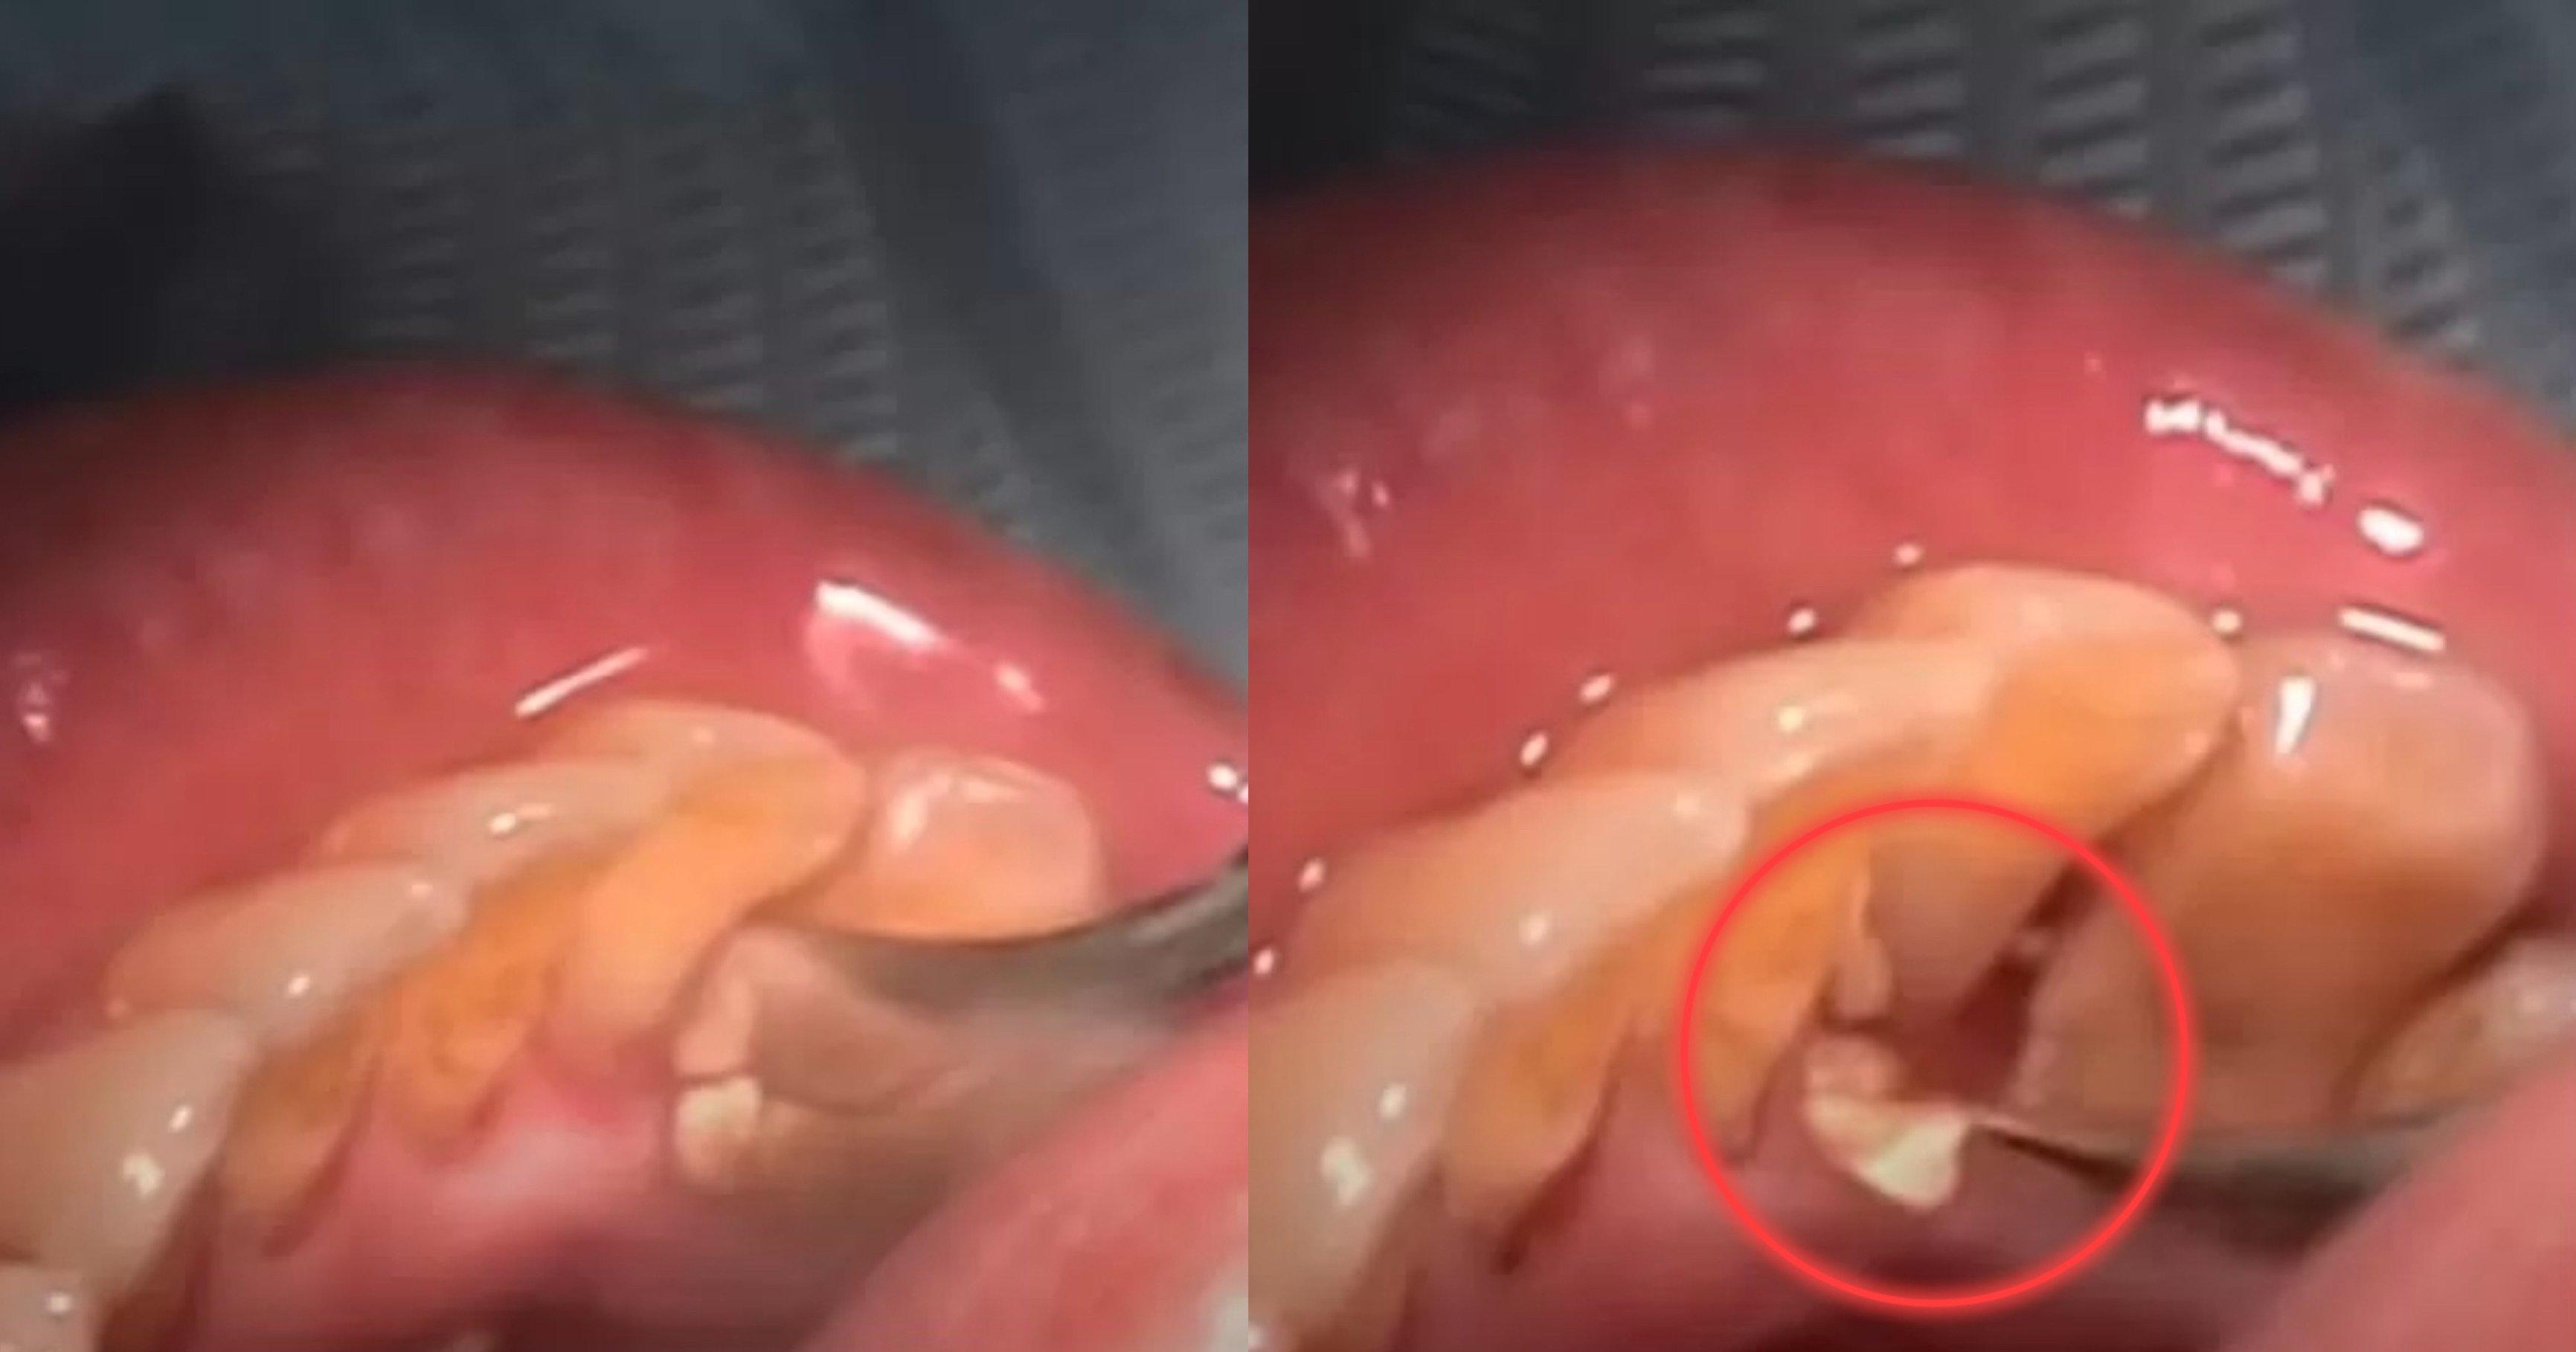 "40b50ef2 fc52 44d9 9cb6 5a045821320a.jpeg?resize=1200,630 - ""와 보기만 해도 시원하다""..치과 의사가 직접 공개한 처음으로 '스케일링' 받는 환자의 '치석' 제거 영상"